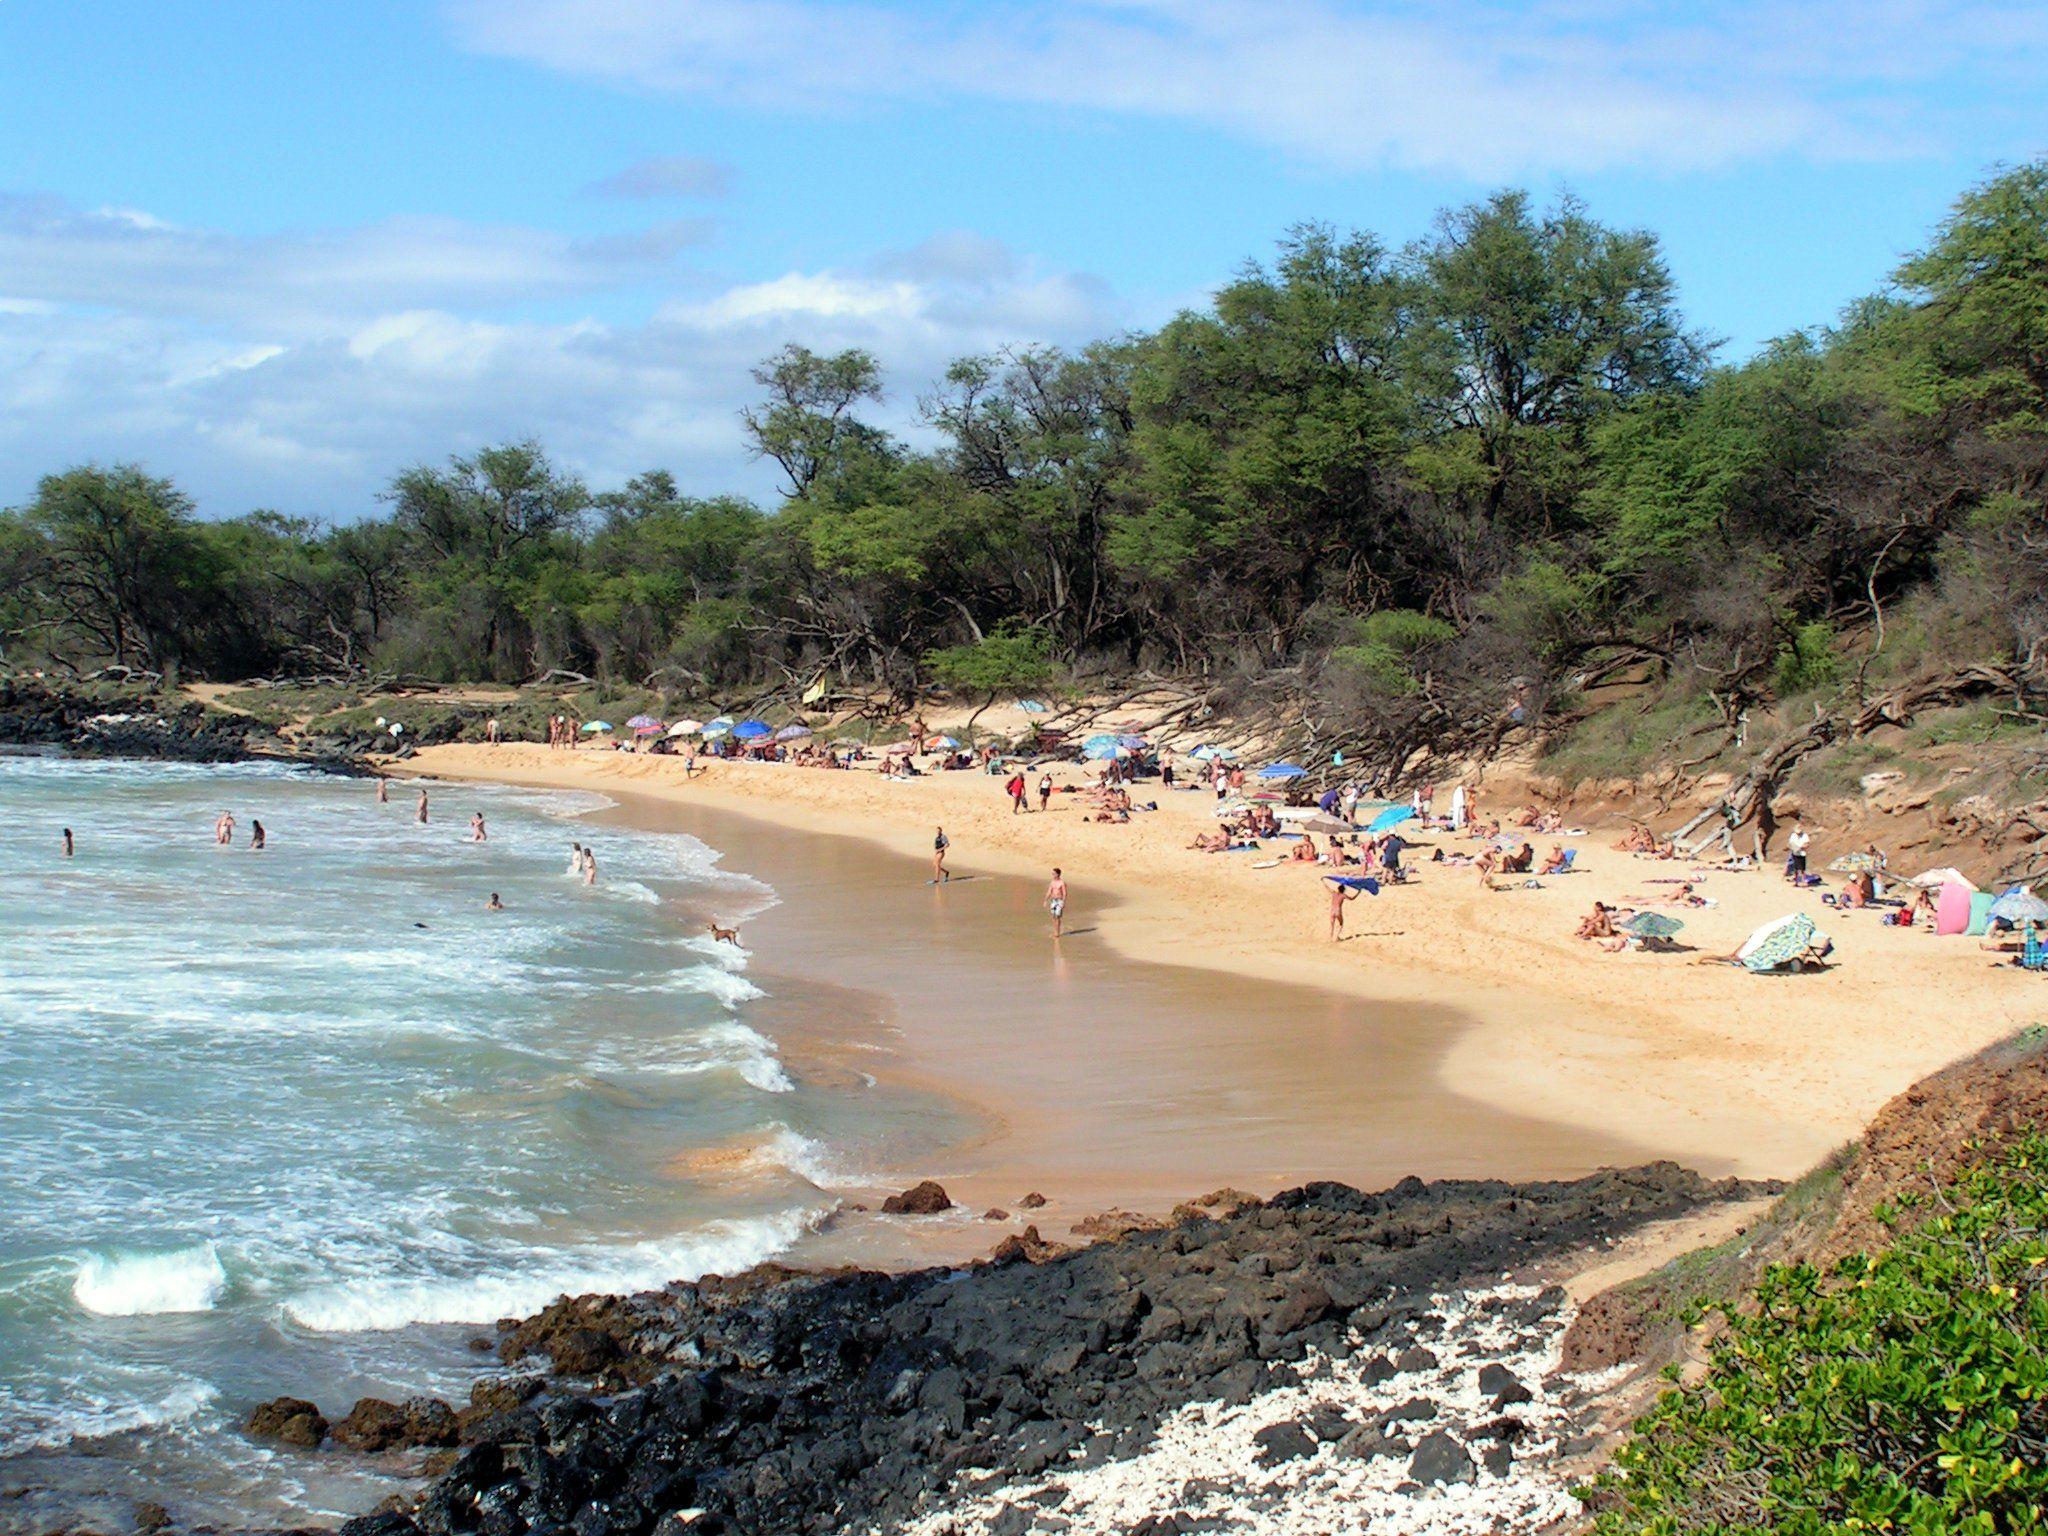 Oahu nudist beach